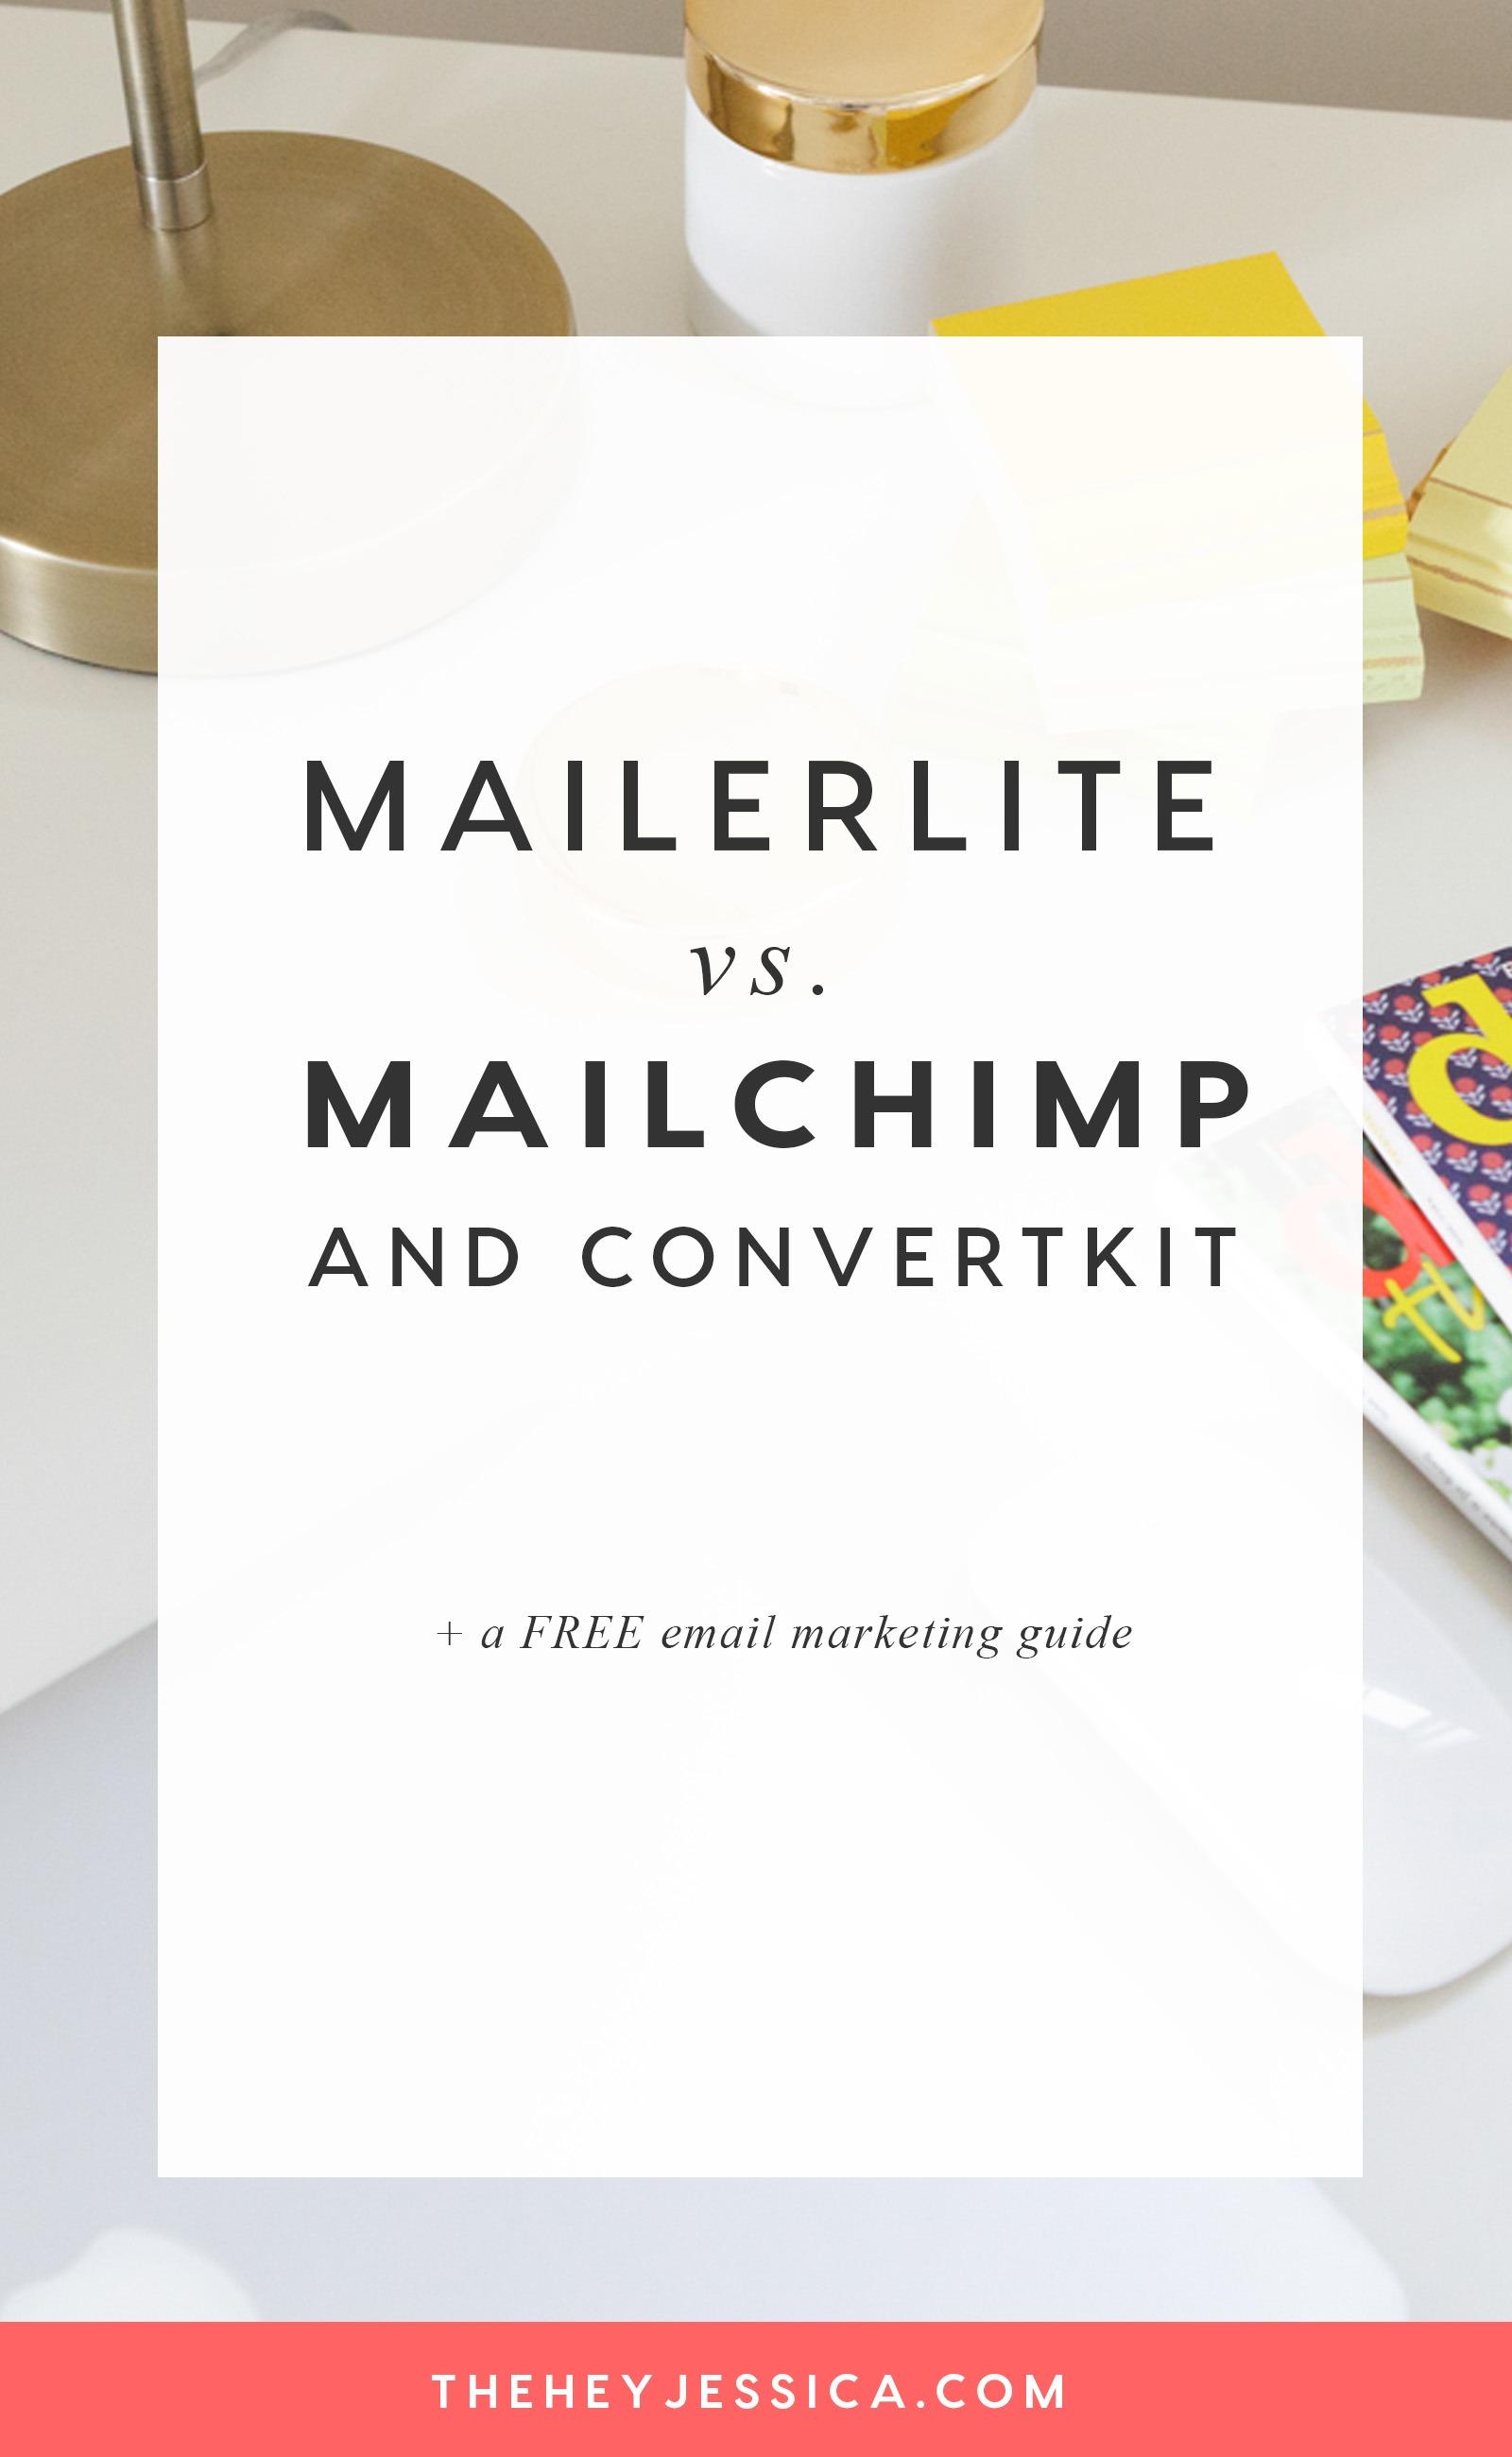 Mailerlite vs. Mailchimp & Convertkit